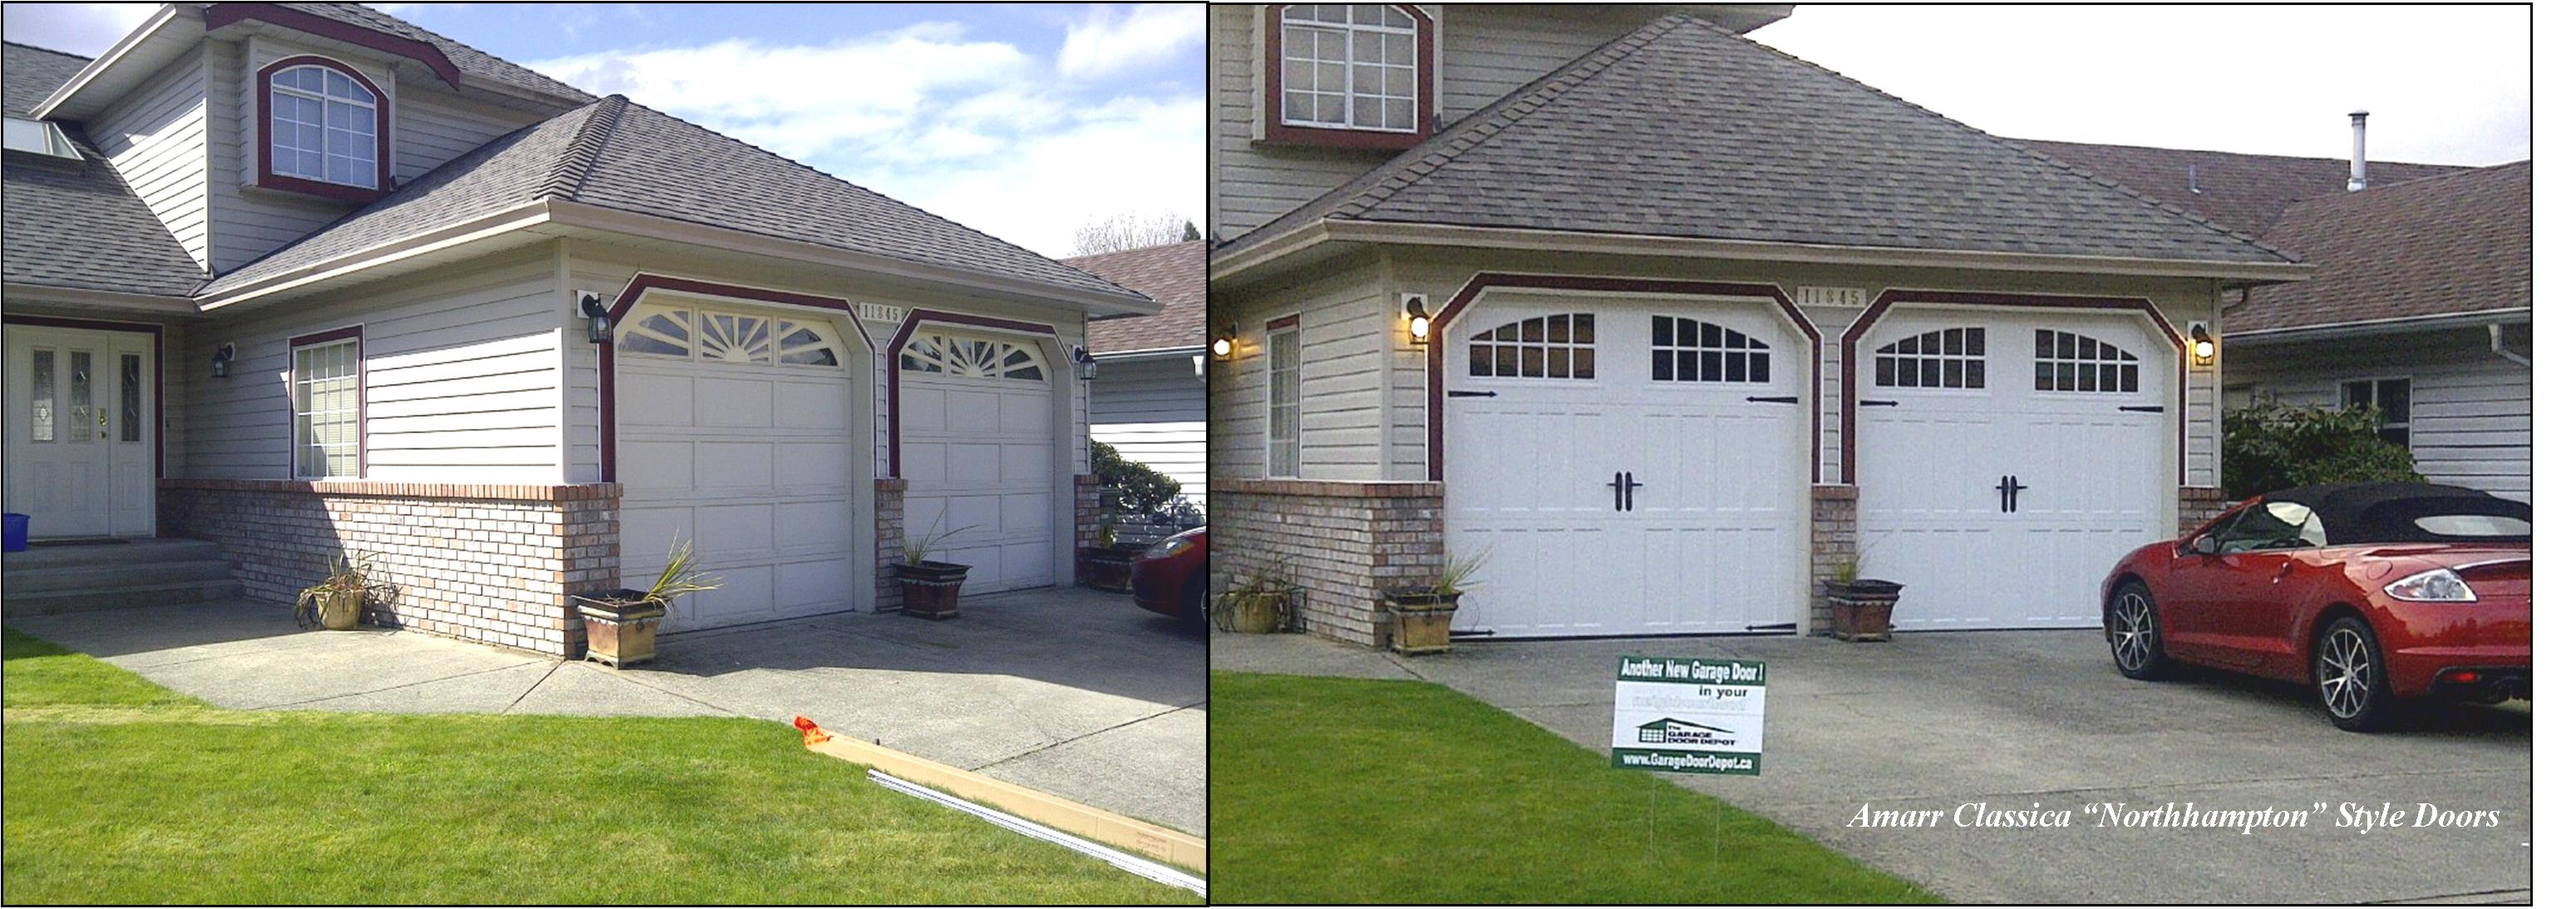 1093 #4F6620 Our Portfolio Gallery The Garage Door Depot North Shore save image Amarr Garage Doors Locations 36173099